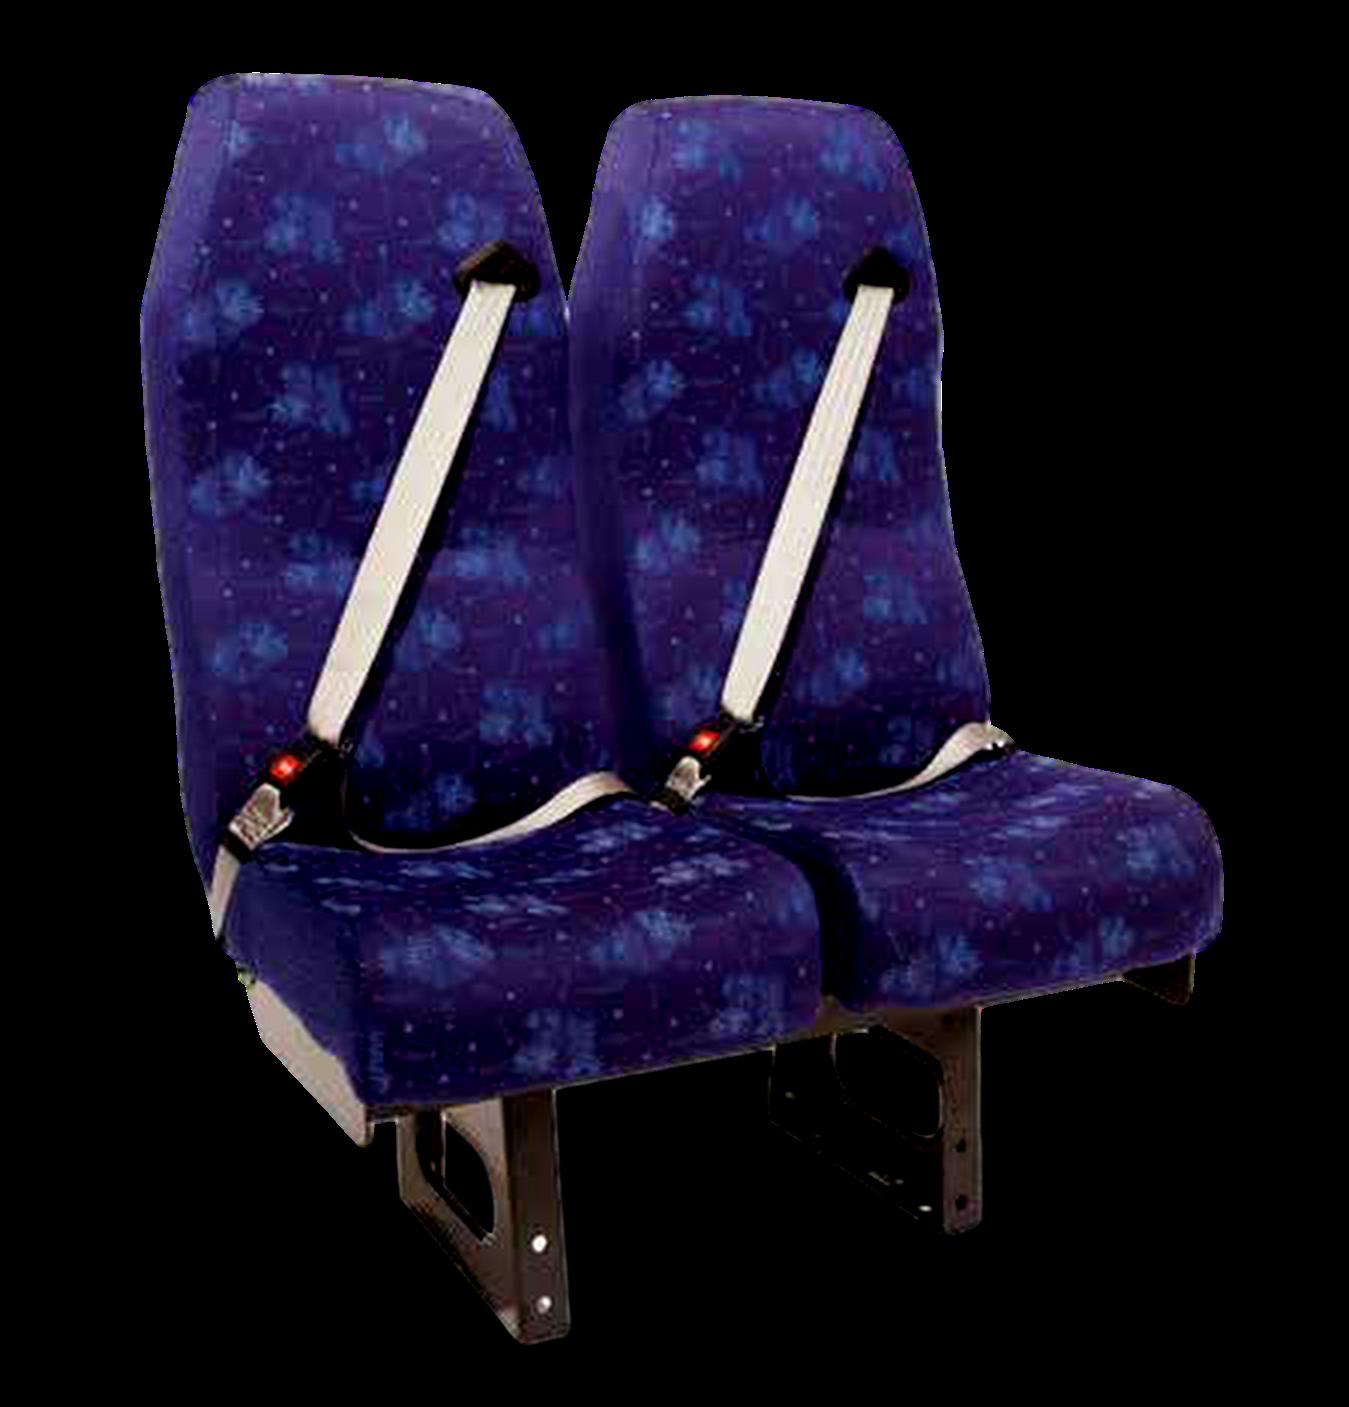 C.E. White Activity Seat School Bus